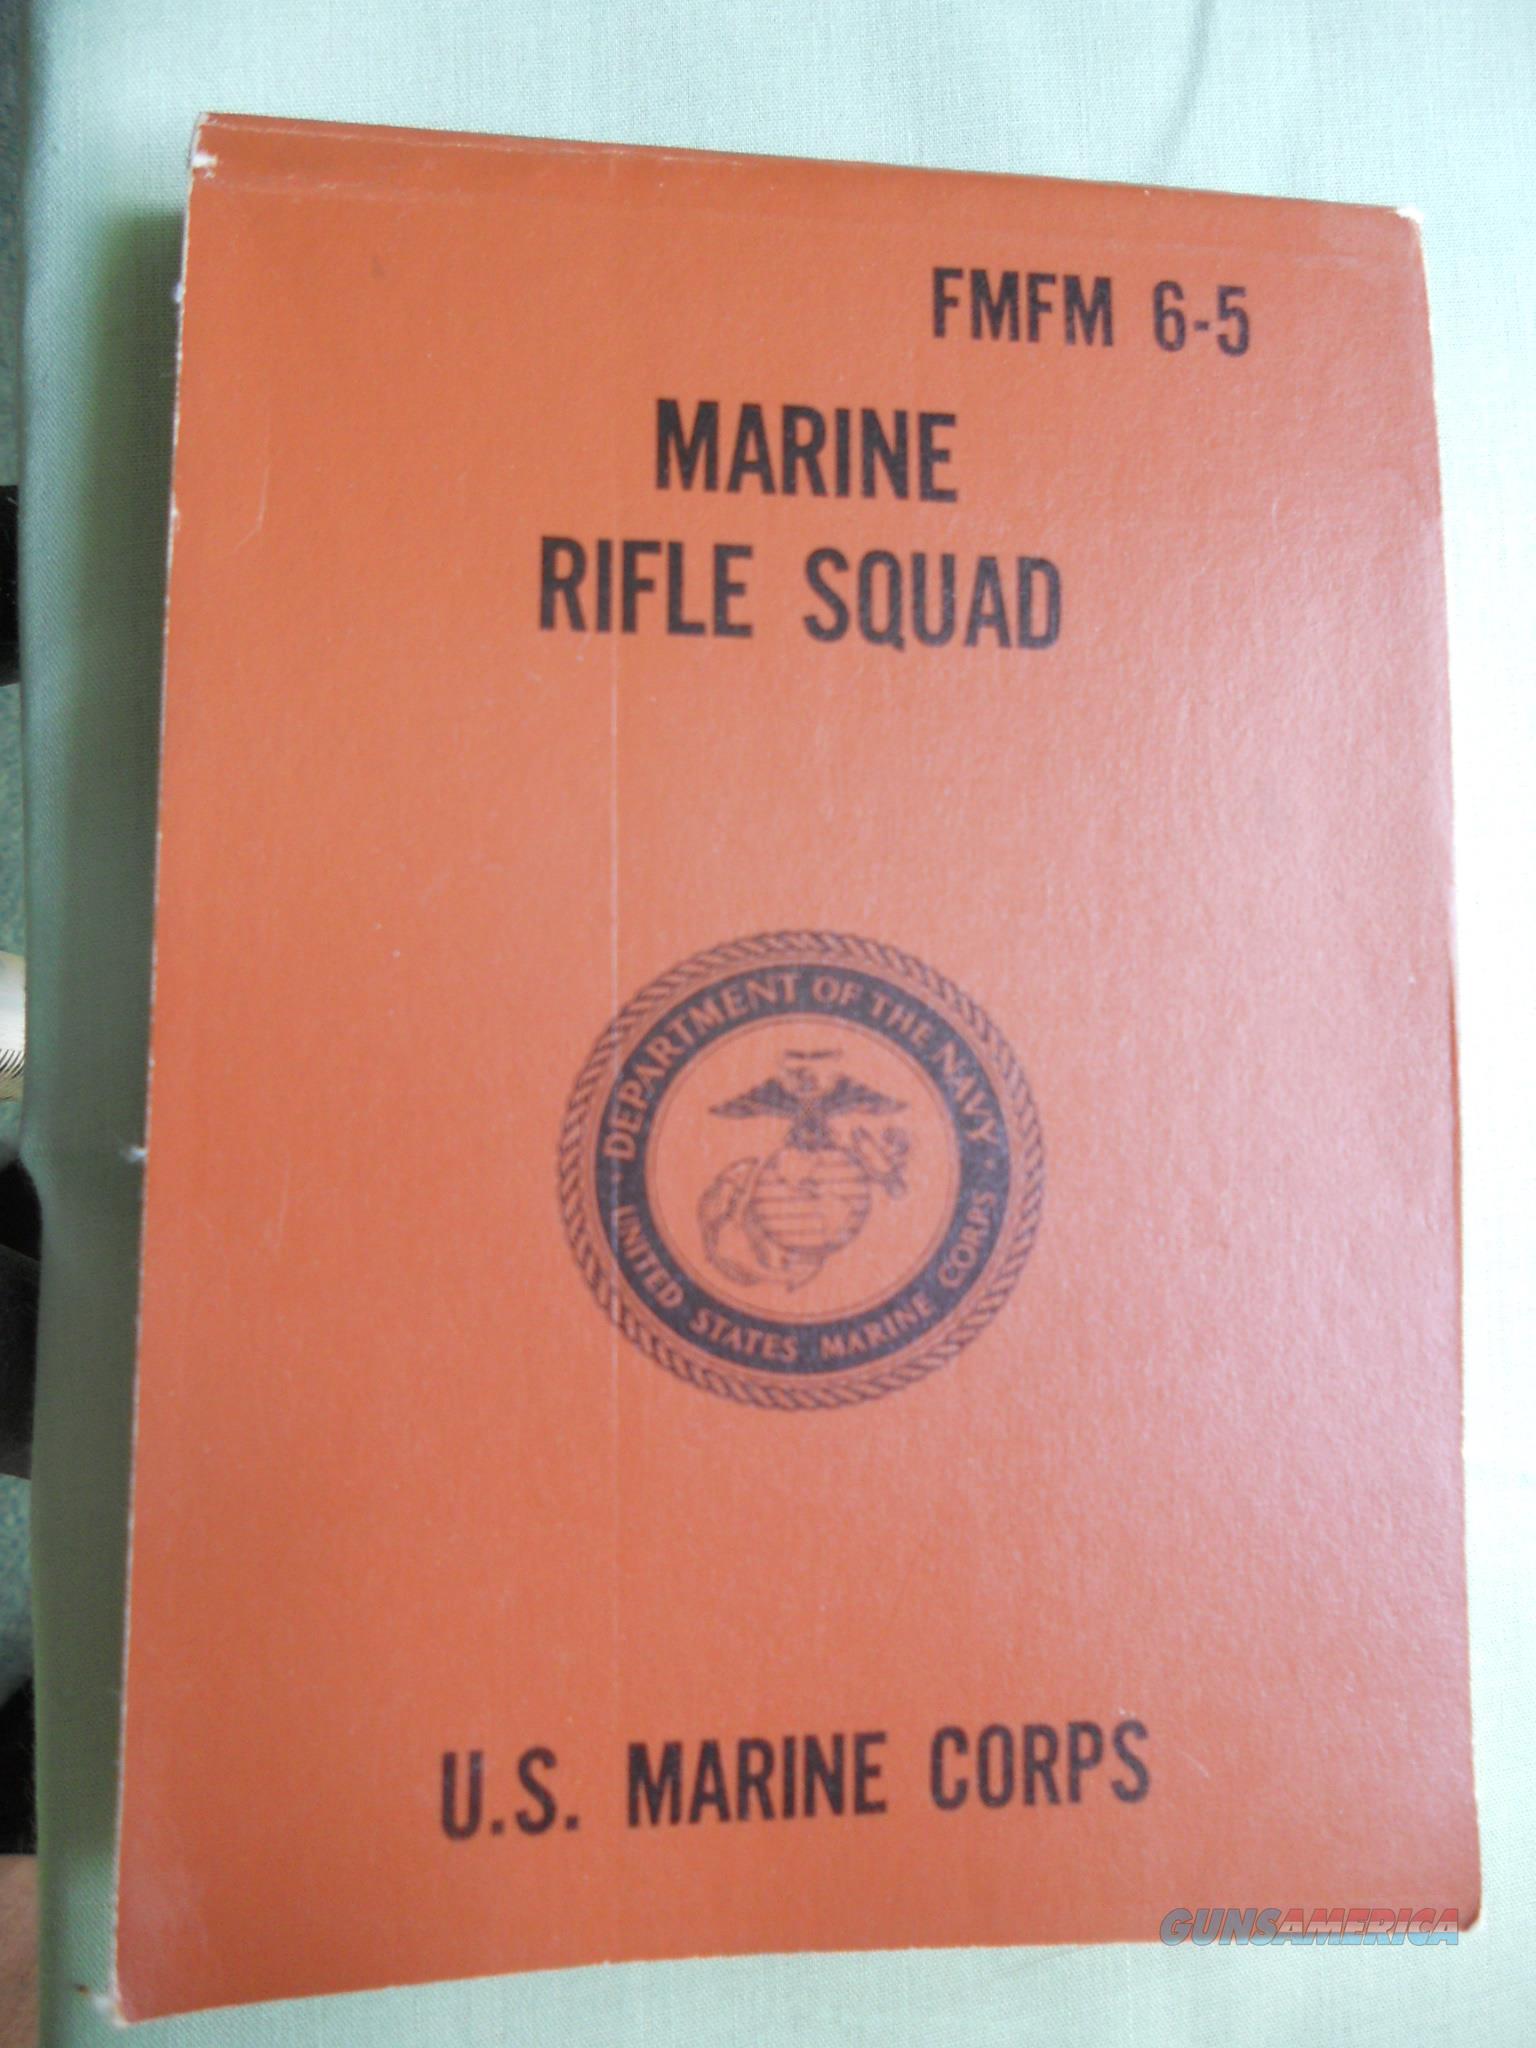 MARINE RIFLE SQUAD Field Manual *FMFM 6-5* vintage 1969   Non-Guns > Military > Books